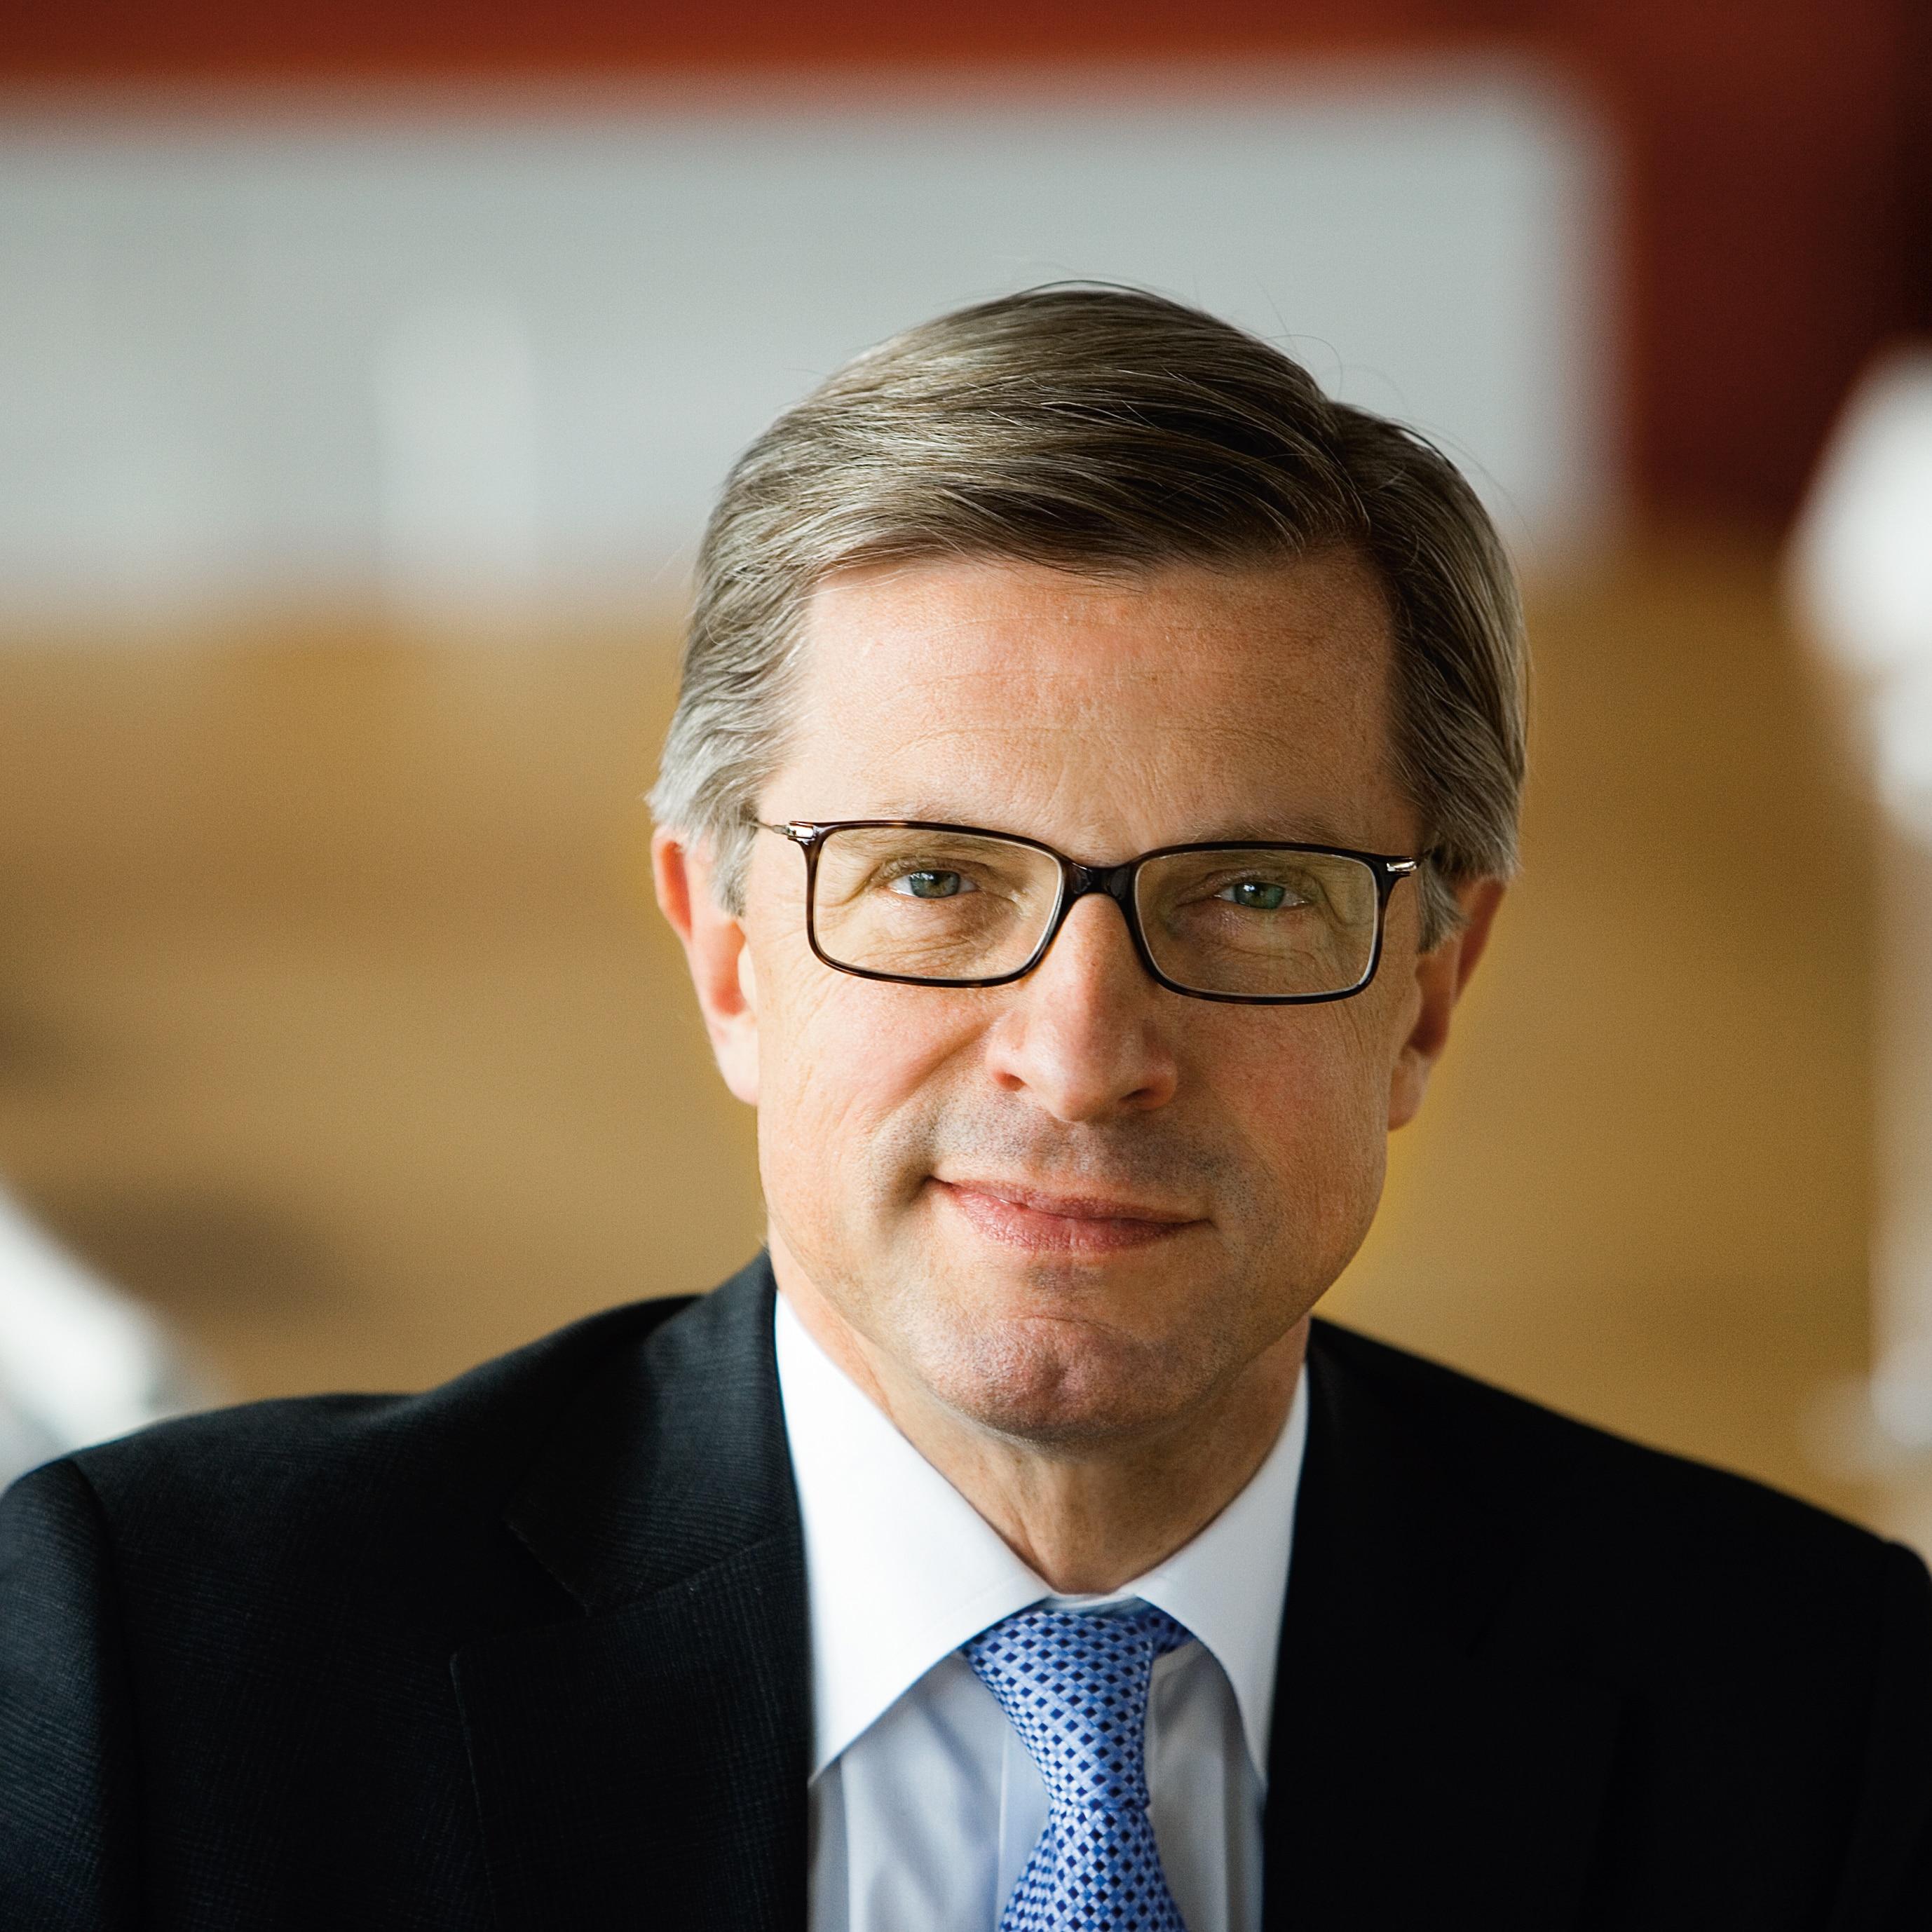 Hans Stråberg, CEO & President Electrolux